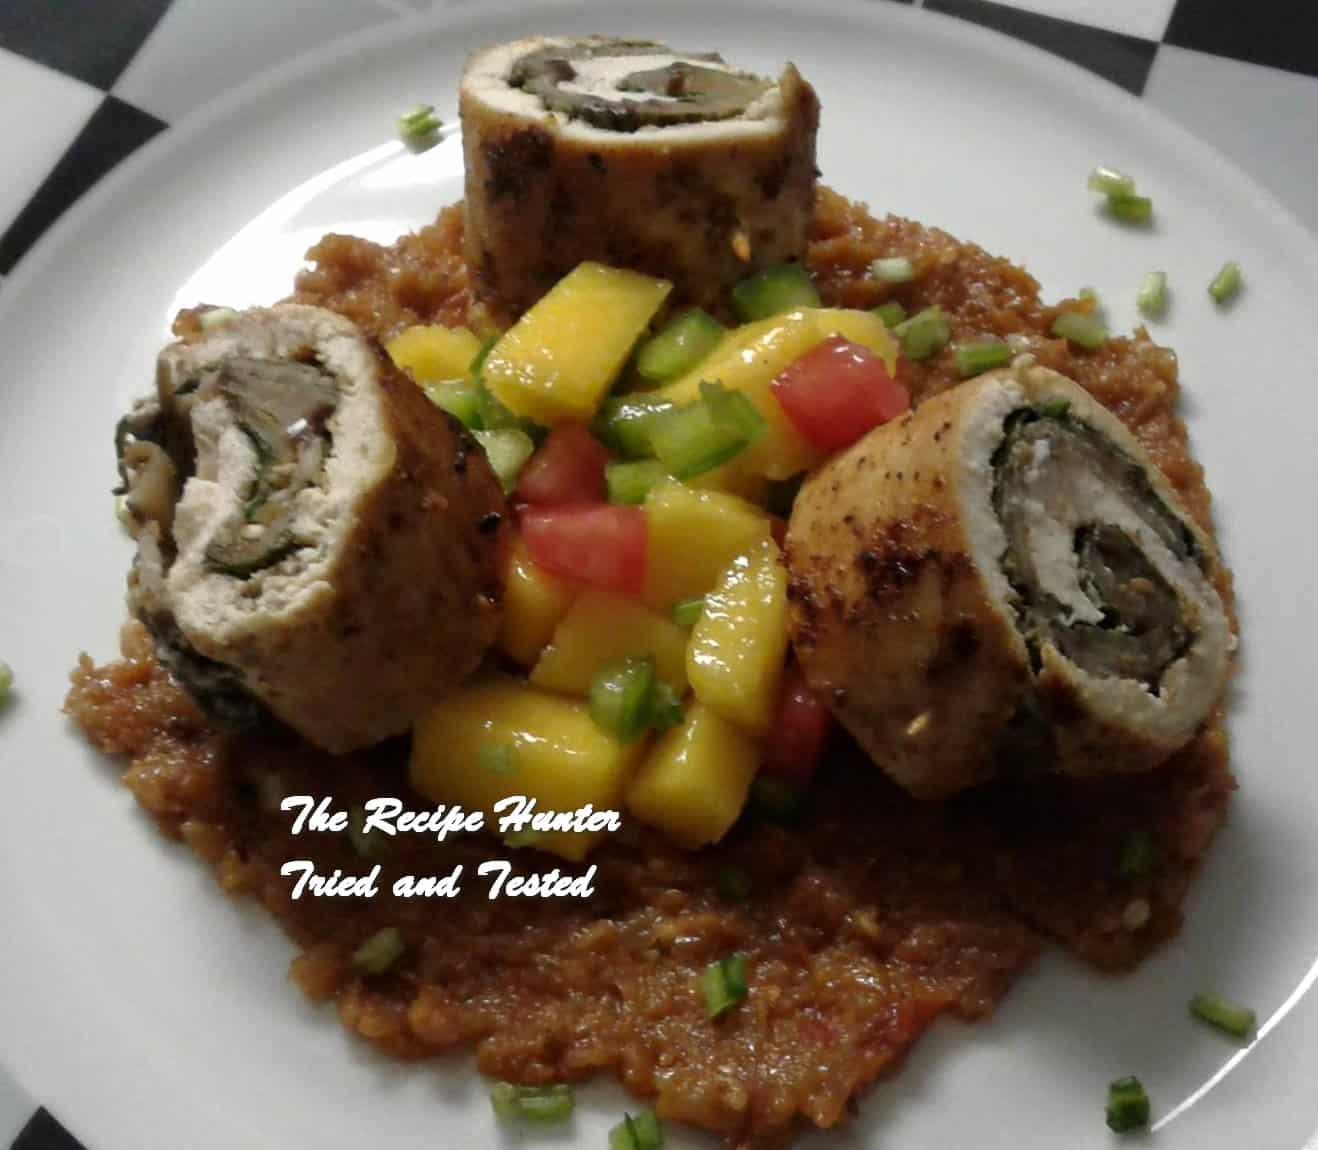 trh-nazleys-chicken-roll-ups-served-with-mango-salsa-and-aubergine-puree2